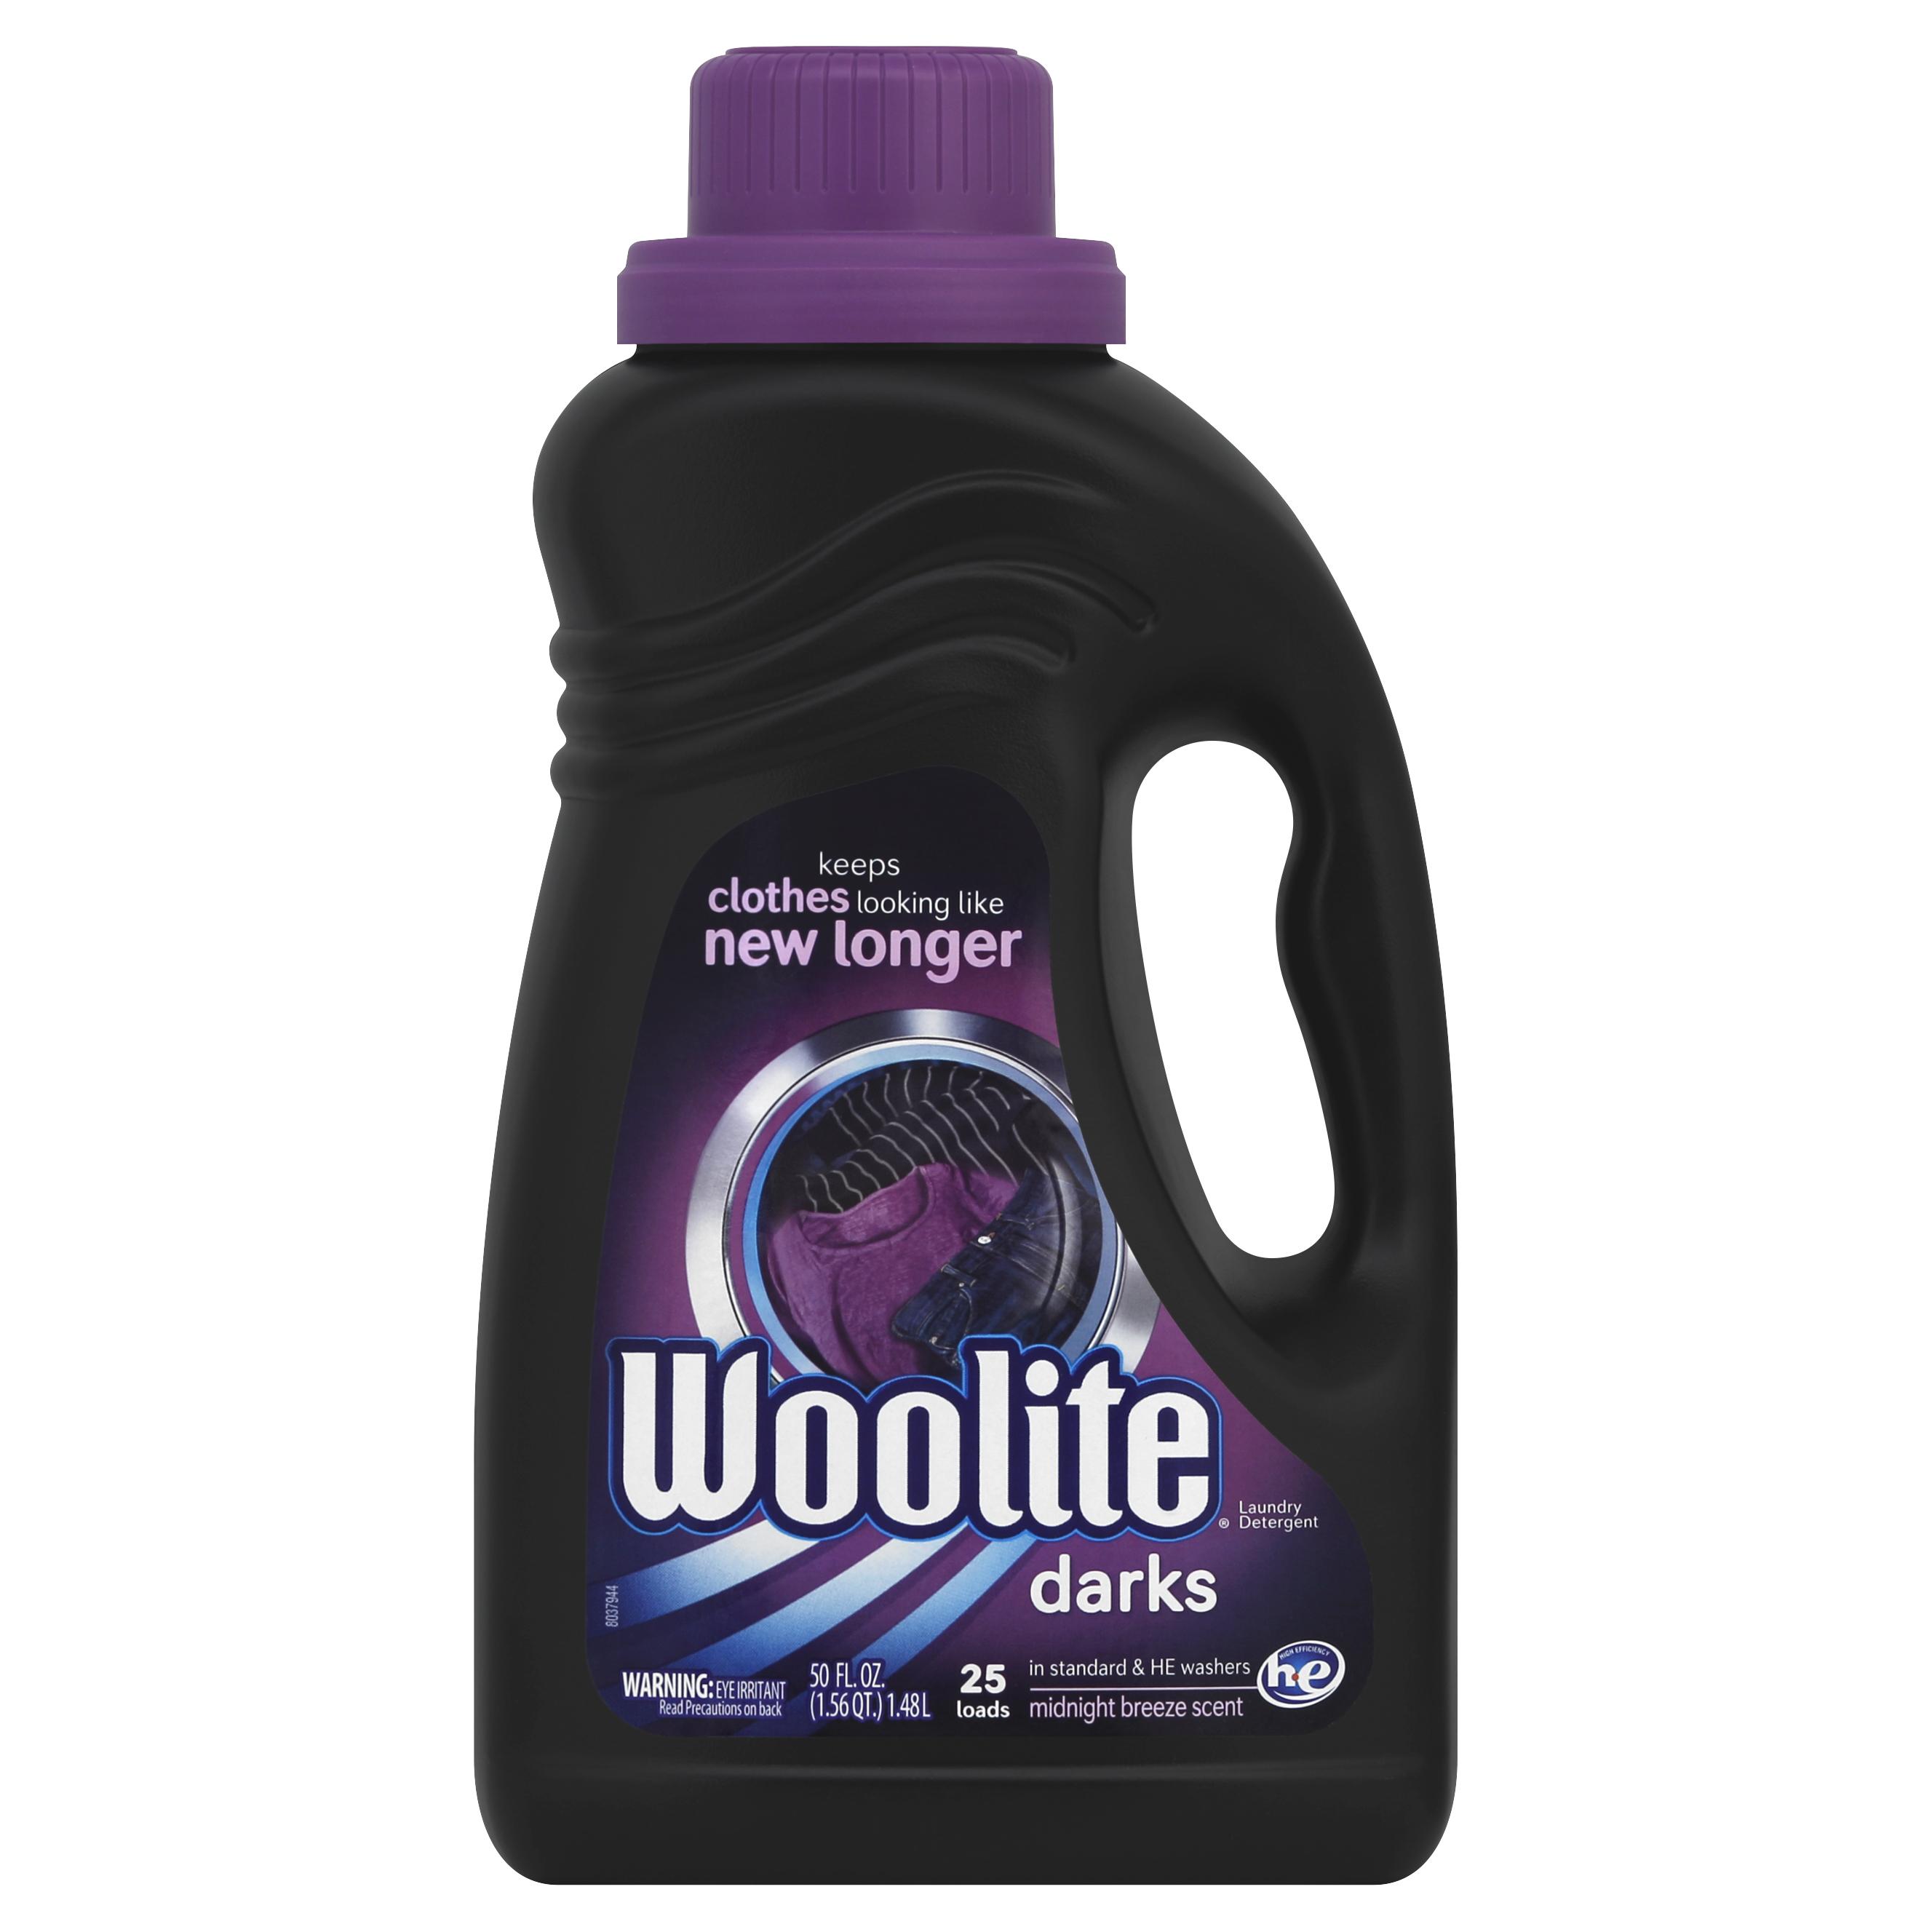 Woolite Dark Care Laundry Detergent, 50 Ounce